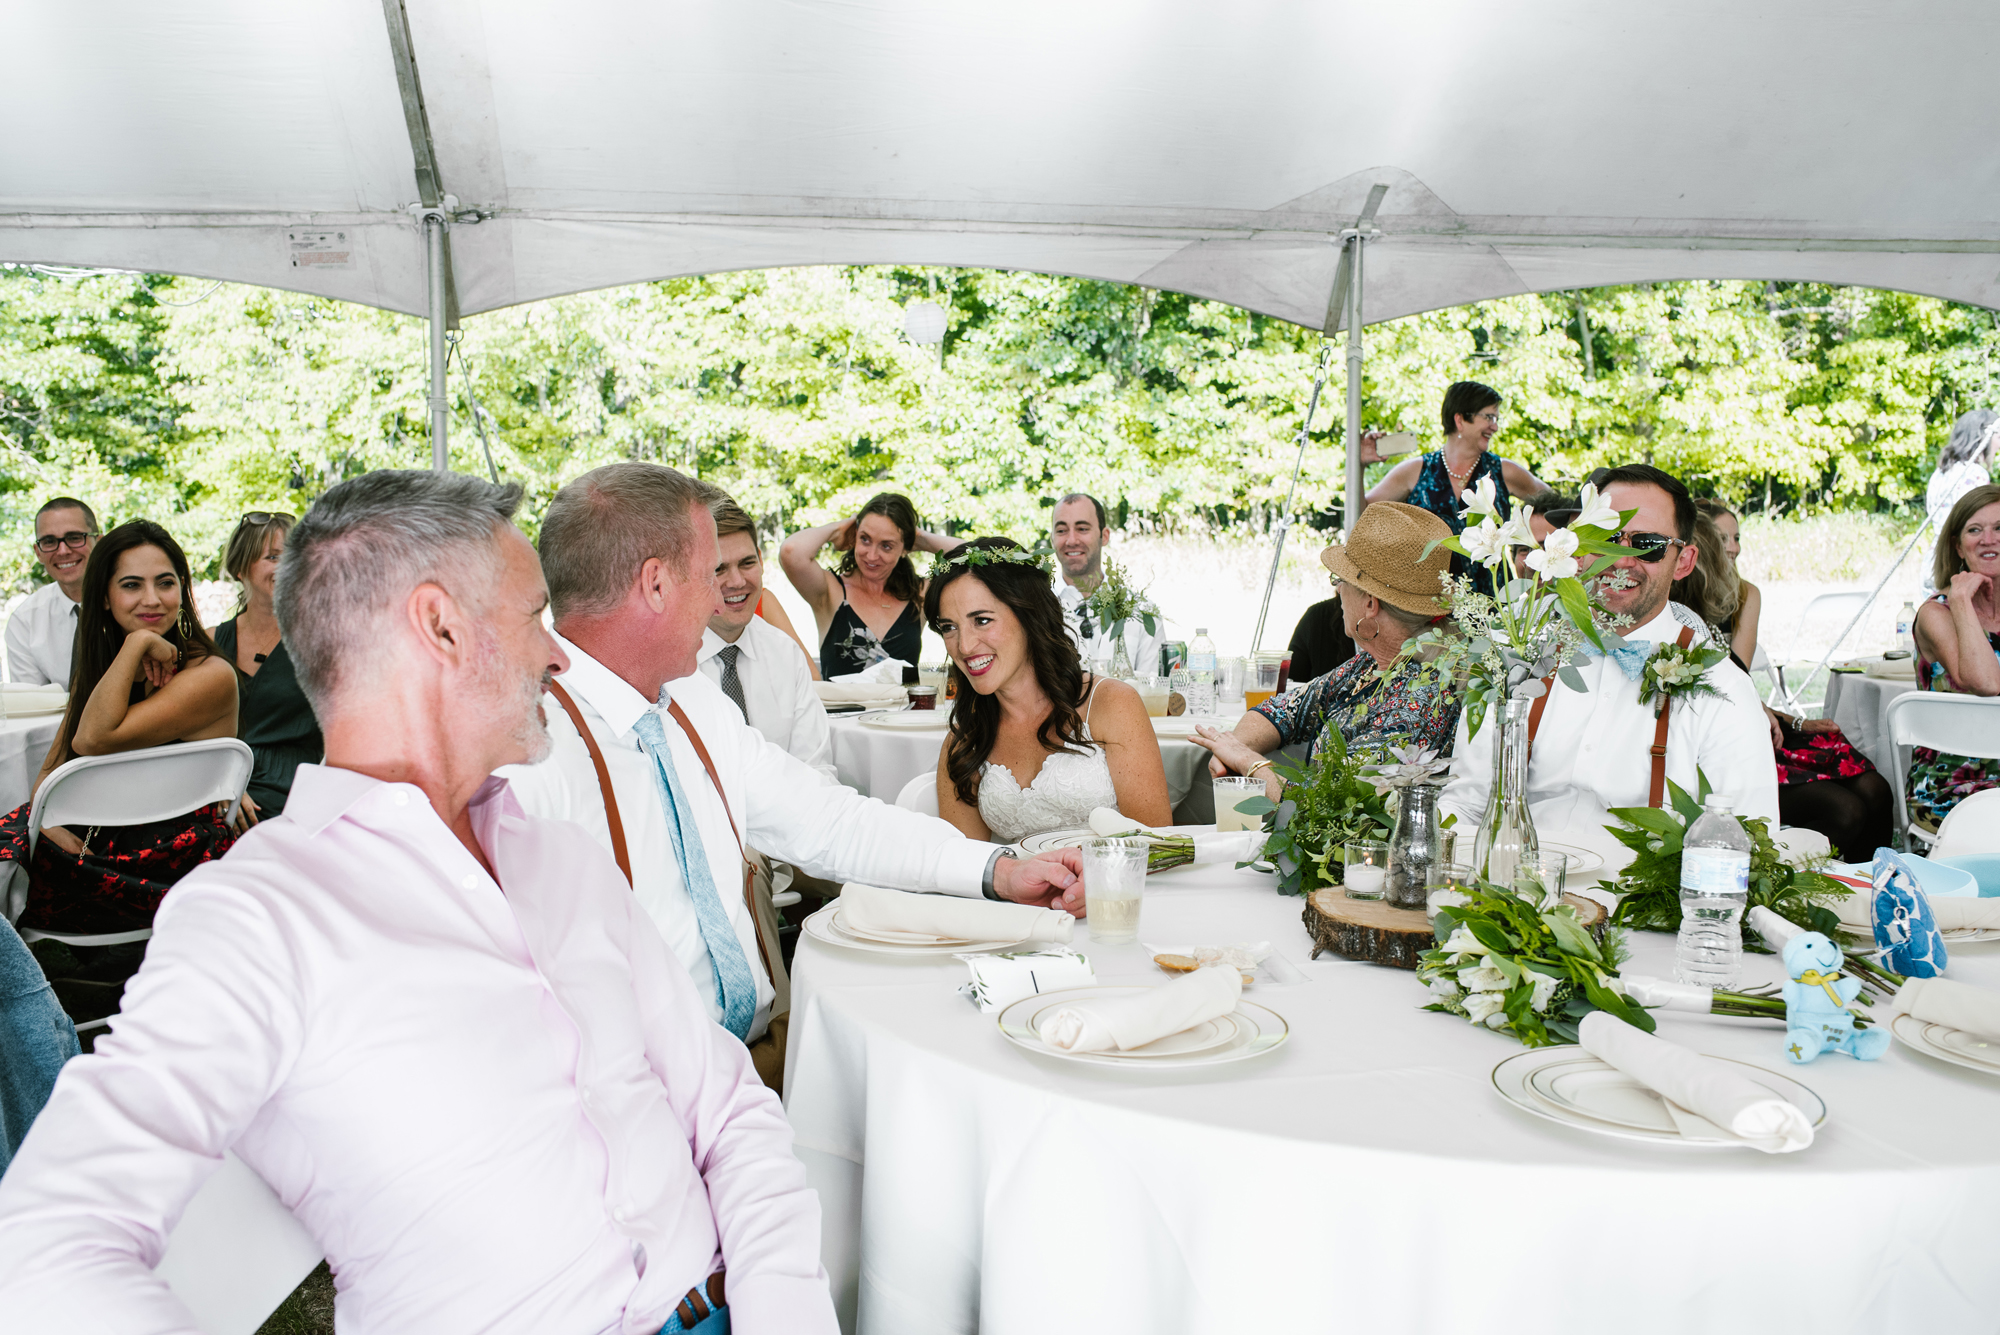 Quincy-Coldwater-Michigan-farm-wedding-photogapher-sydney-marie (383).jpg